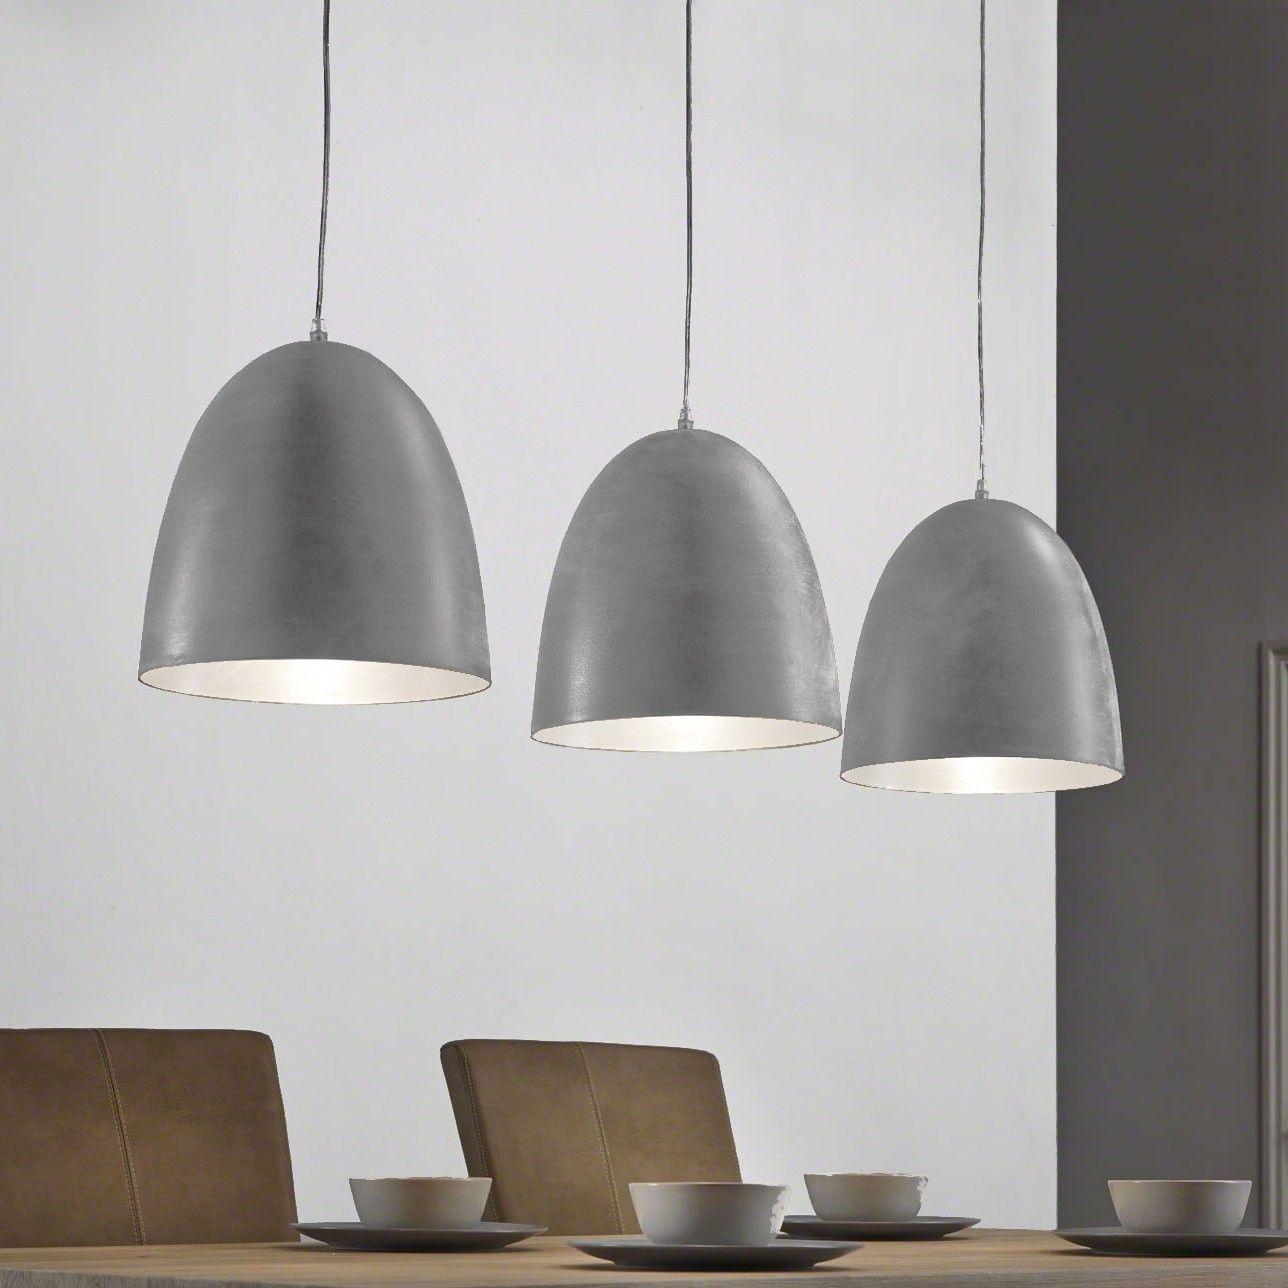 Industriele Hanglamp Florence 3 Lamps Kleur Grijs Industriele Hanglampen Hanglamp Lampen